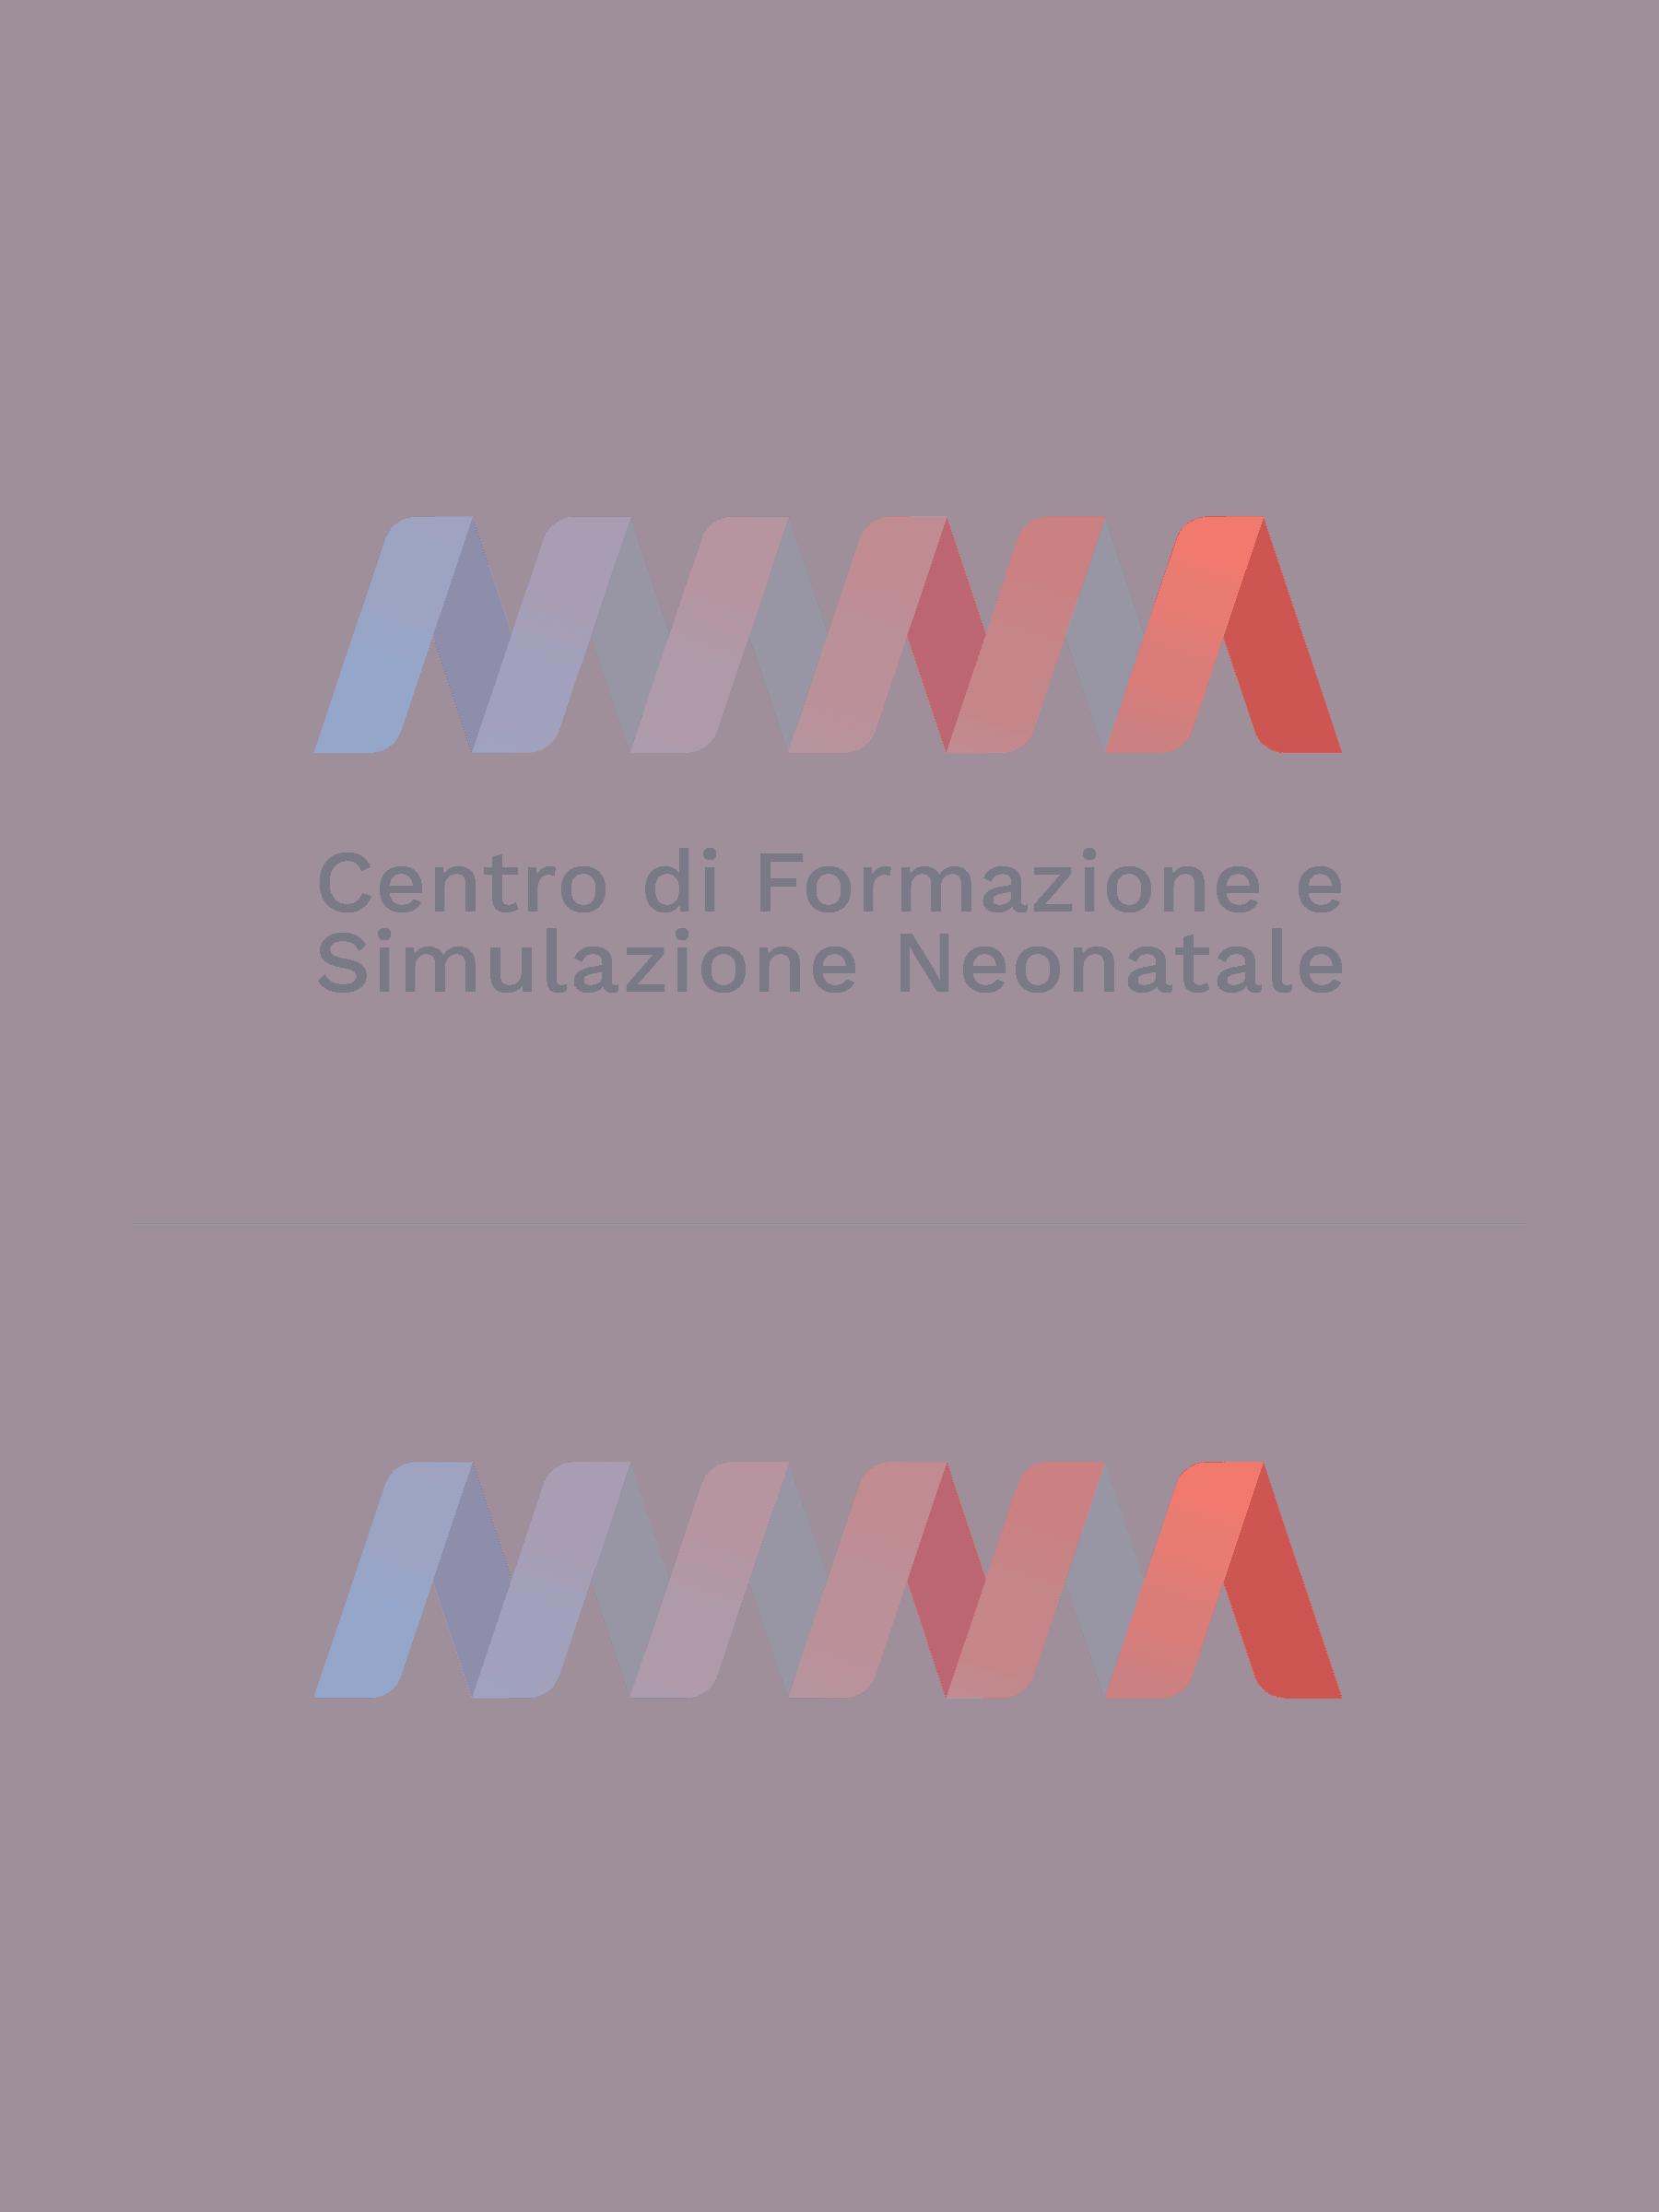 NINA logo color